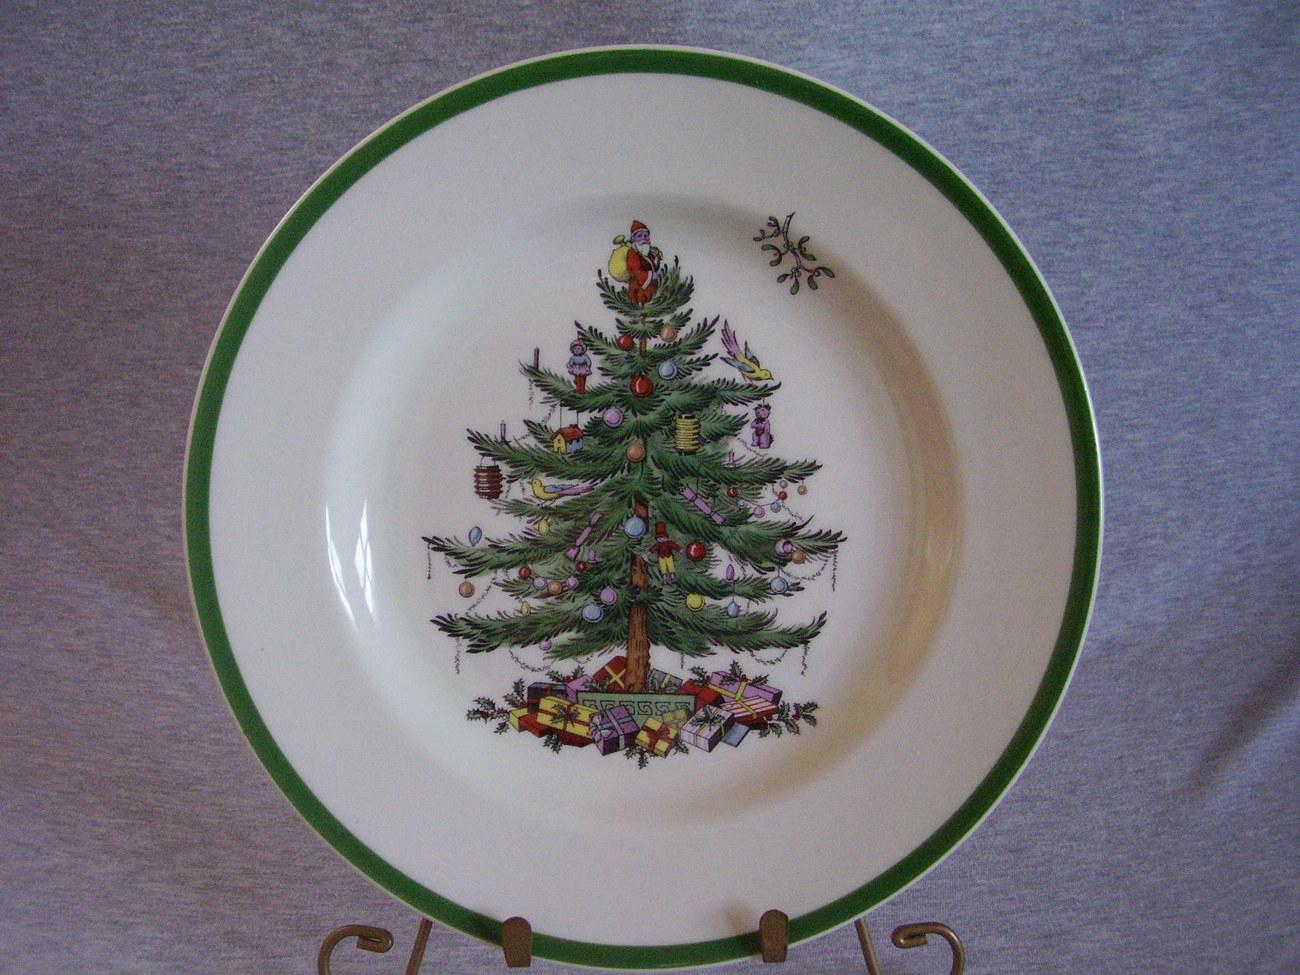 Spode China Christmas Tree Dinner Plate